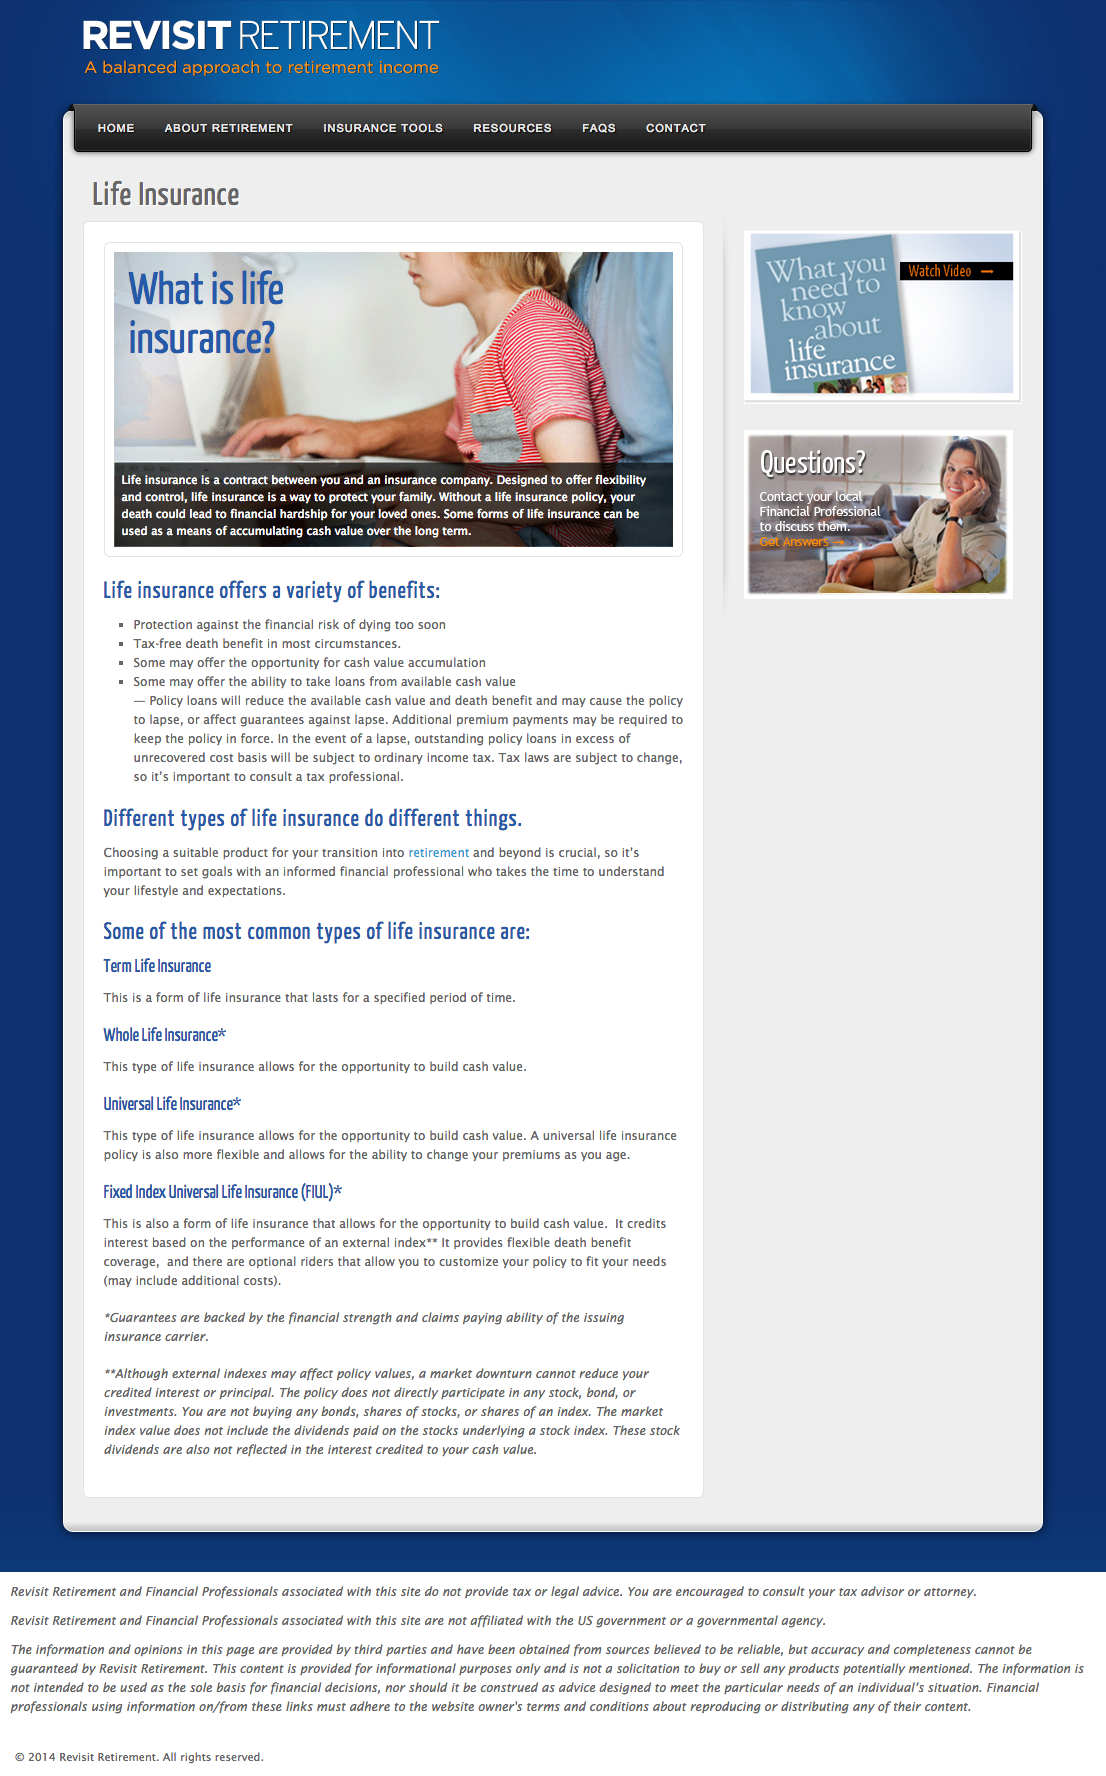 Revisit Retirement_Life Insurance.png